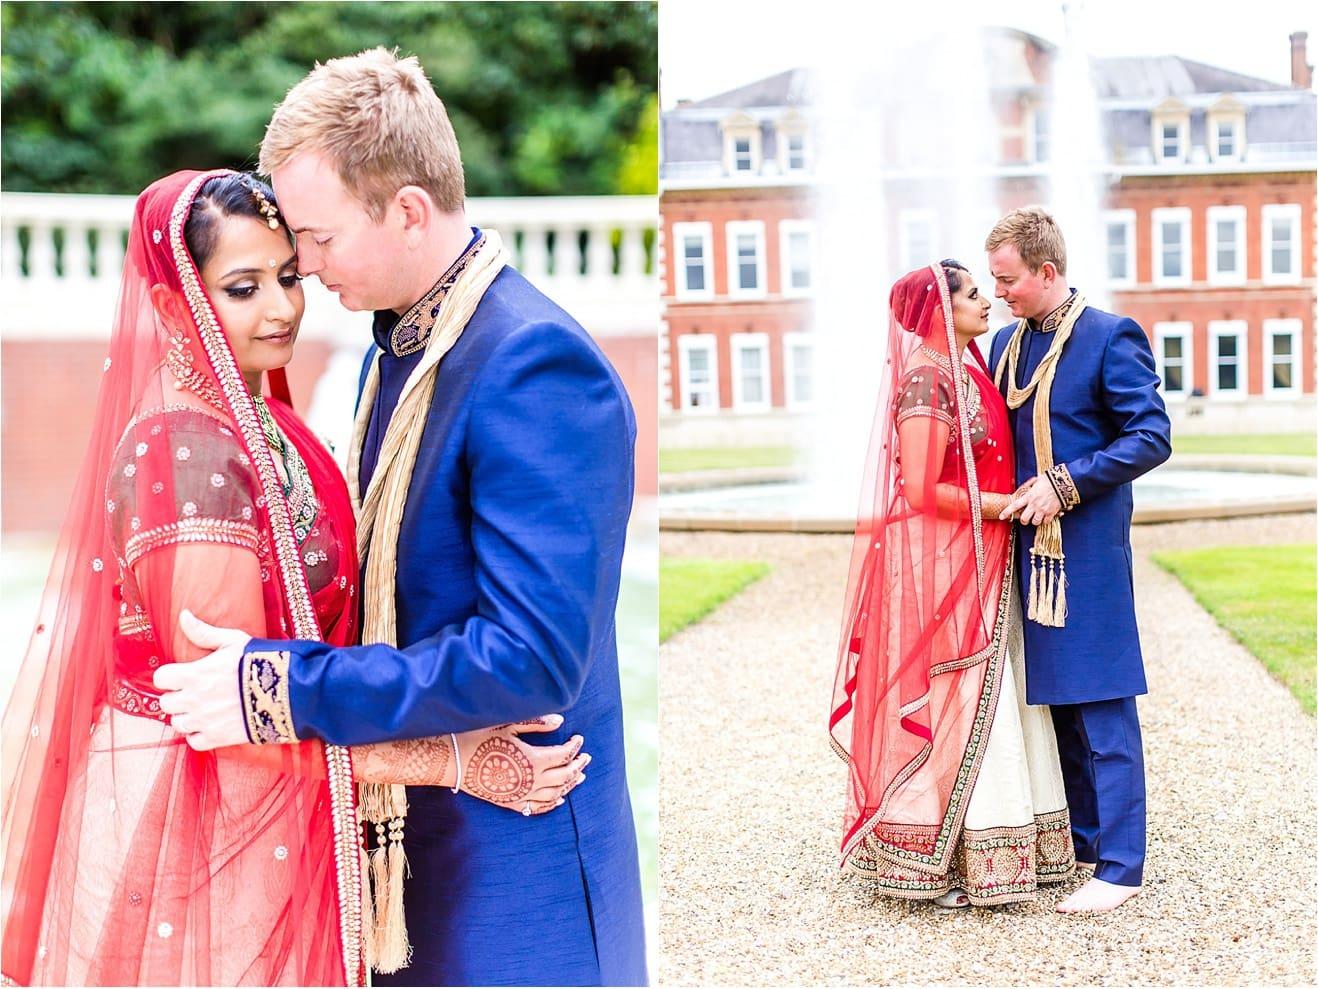 FETCHAM-PARK-SURREY-SWAN-GLOBE-LONDON-WEDDING-PHOTOGRAPHY-EDDIE-JUDD_0013